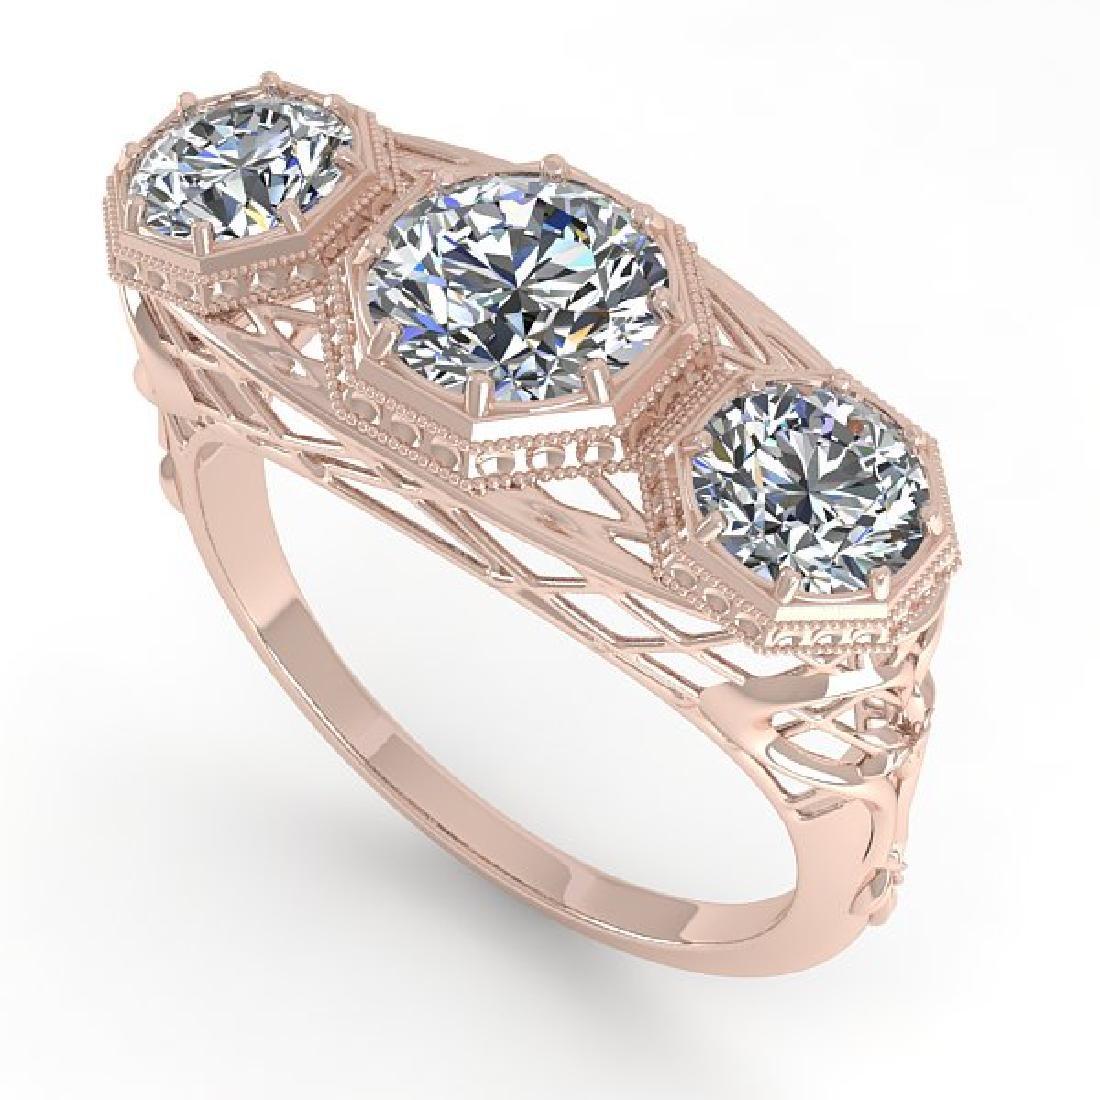 2 CTW VS/SI Diamond Ring 14K Rose Gold - 2